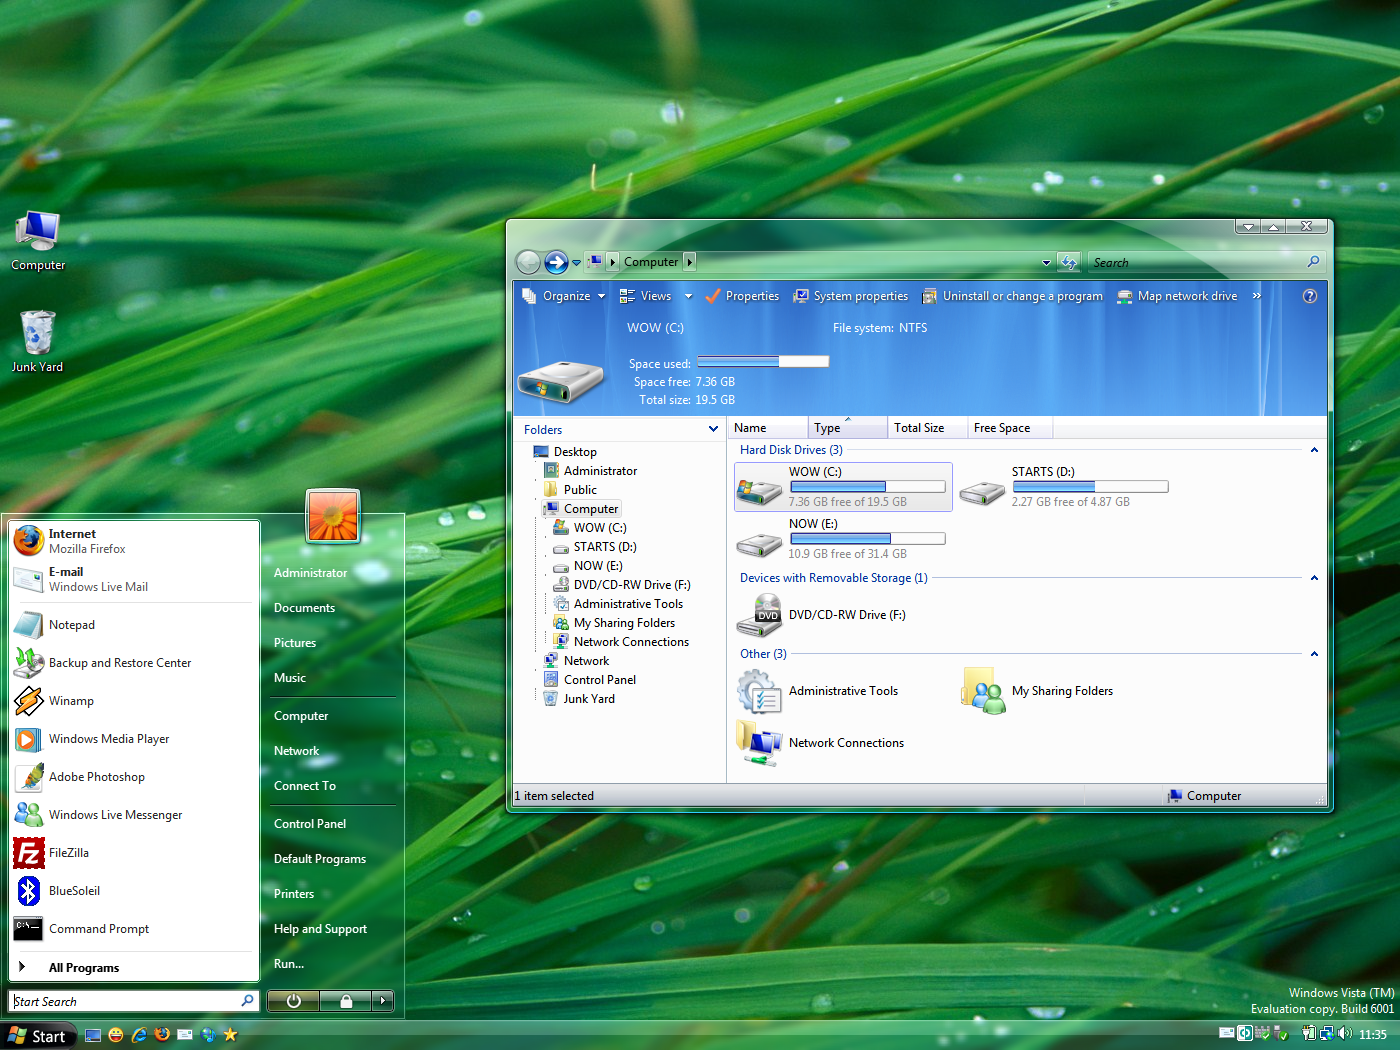 1400x1050 > Windows Vista Wallpapers